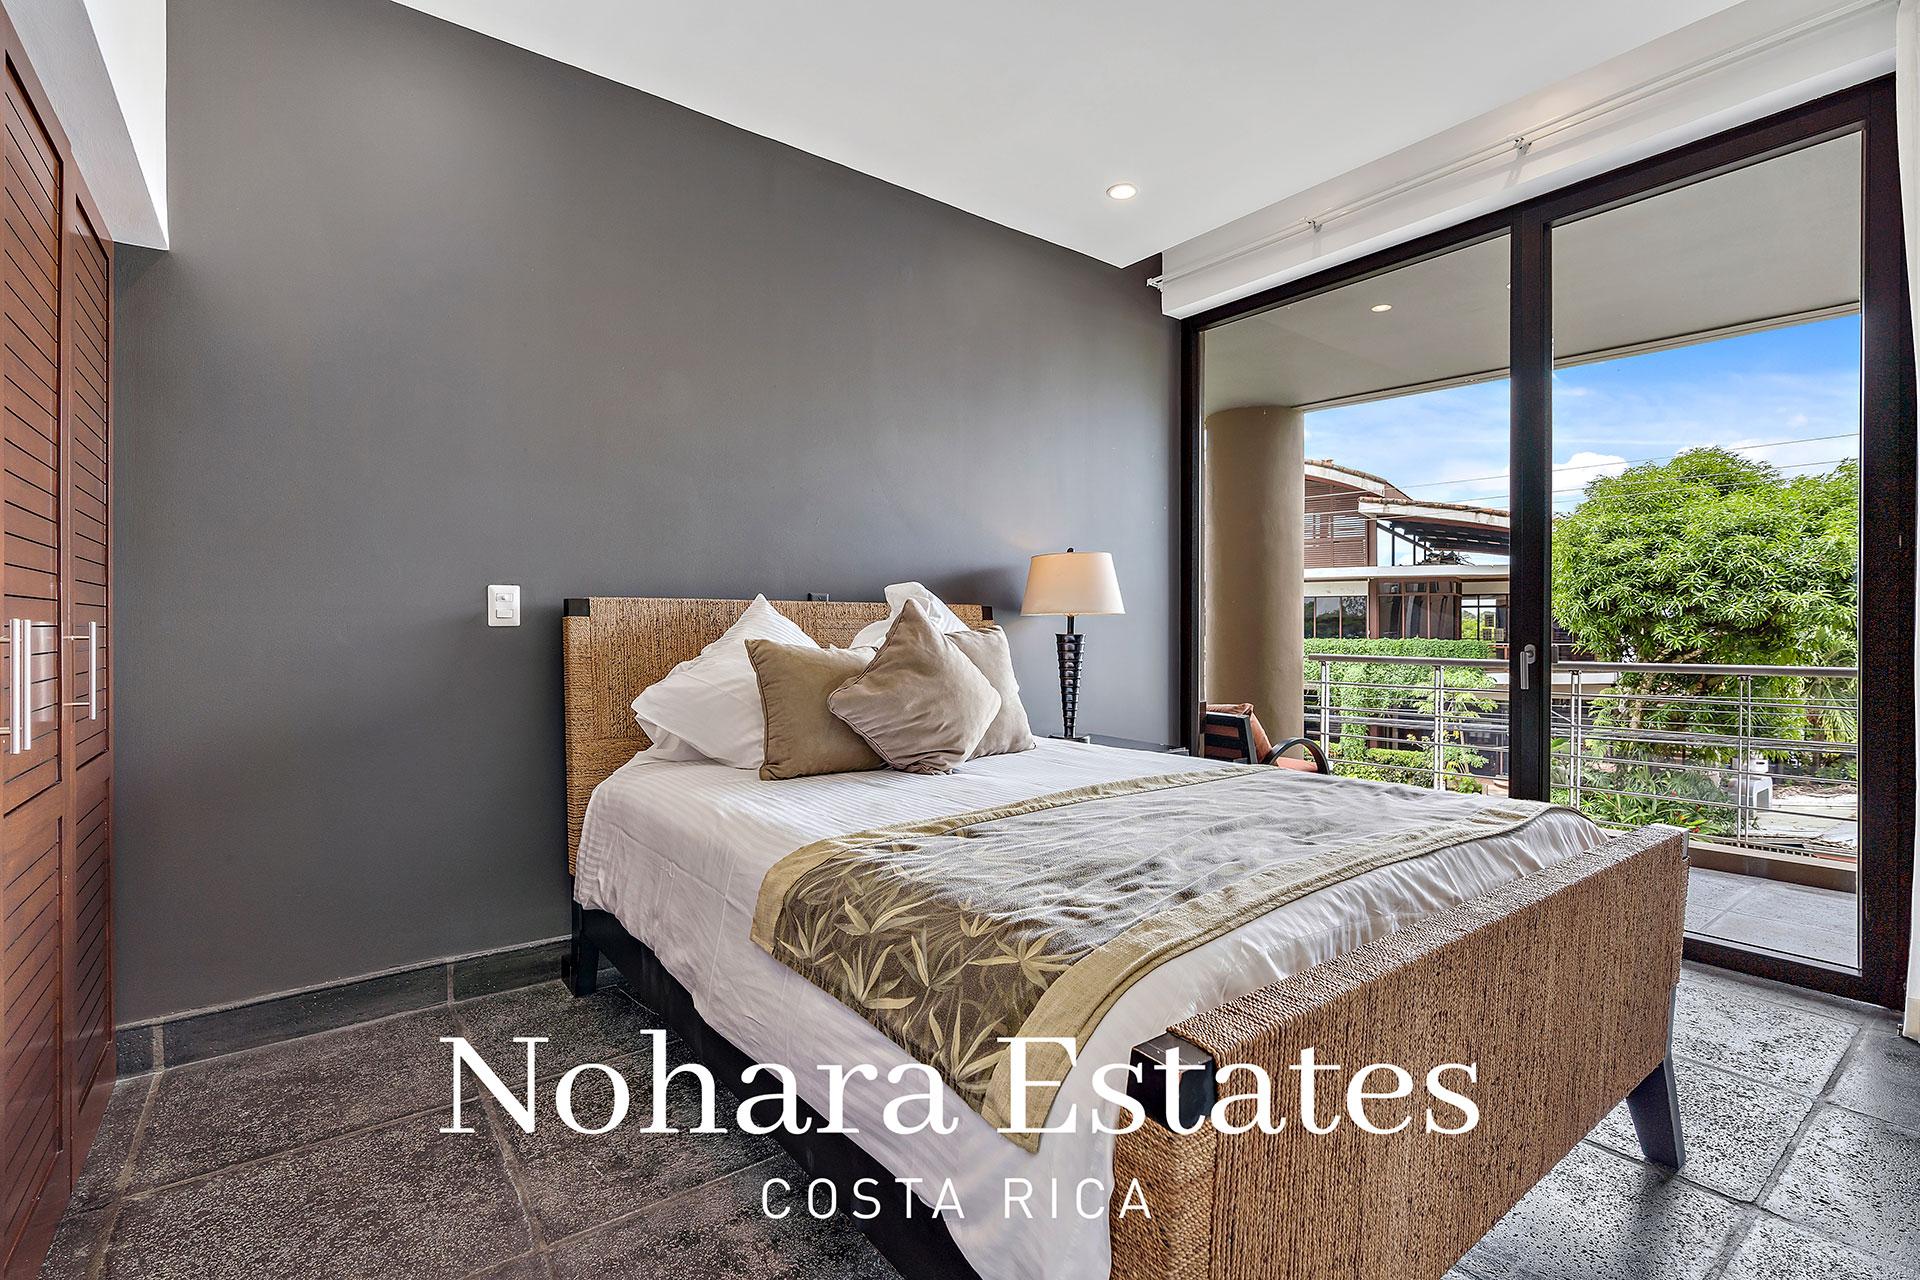 Nohara Estates Costa Rica 128 Penthouse Quepos Los Altos 9